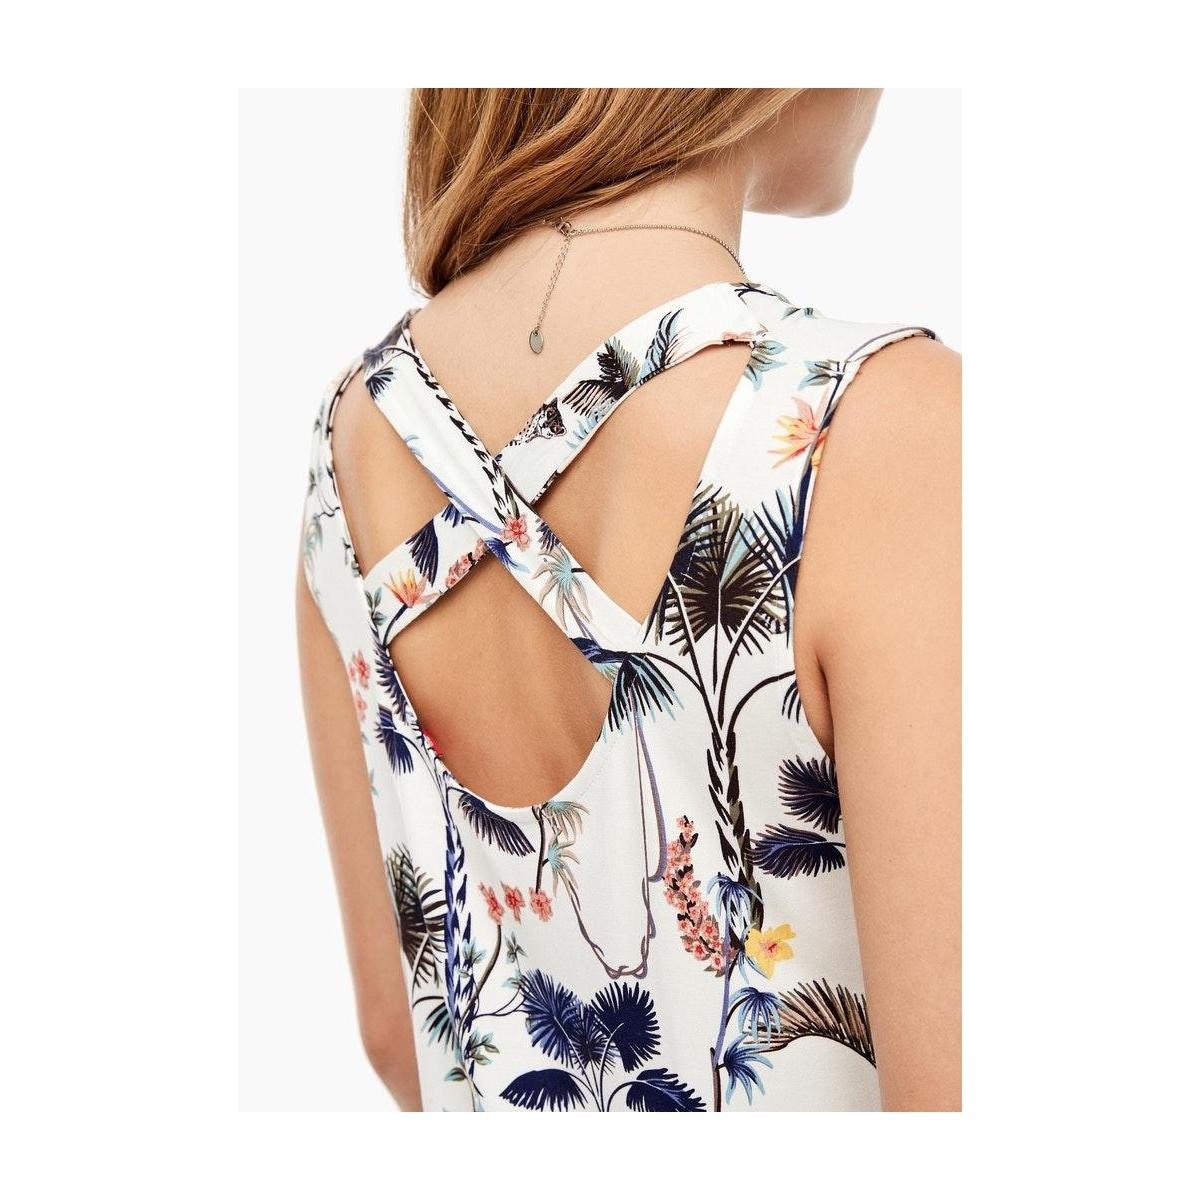 jurk met jungle patroon 05006823883 s.oliver jurk 02b2